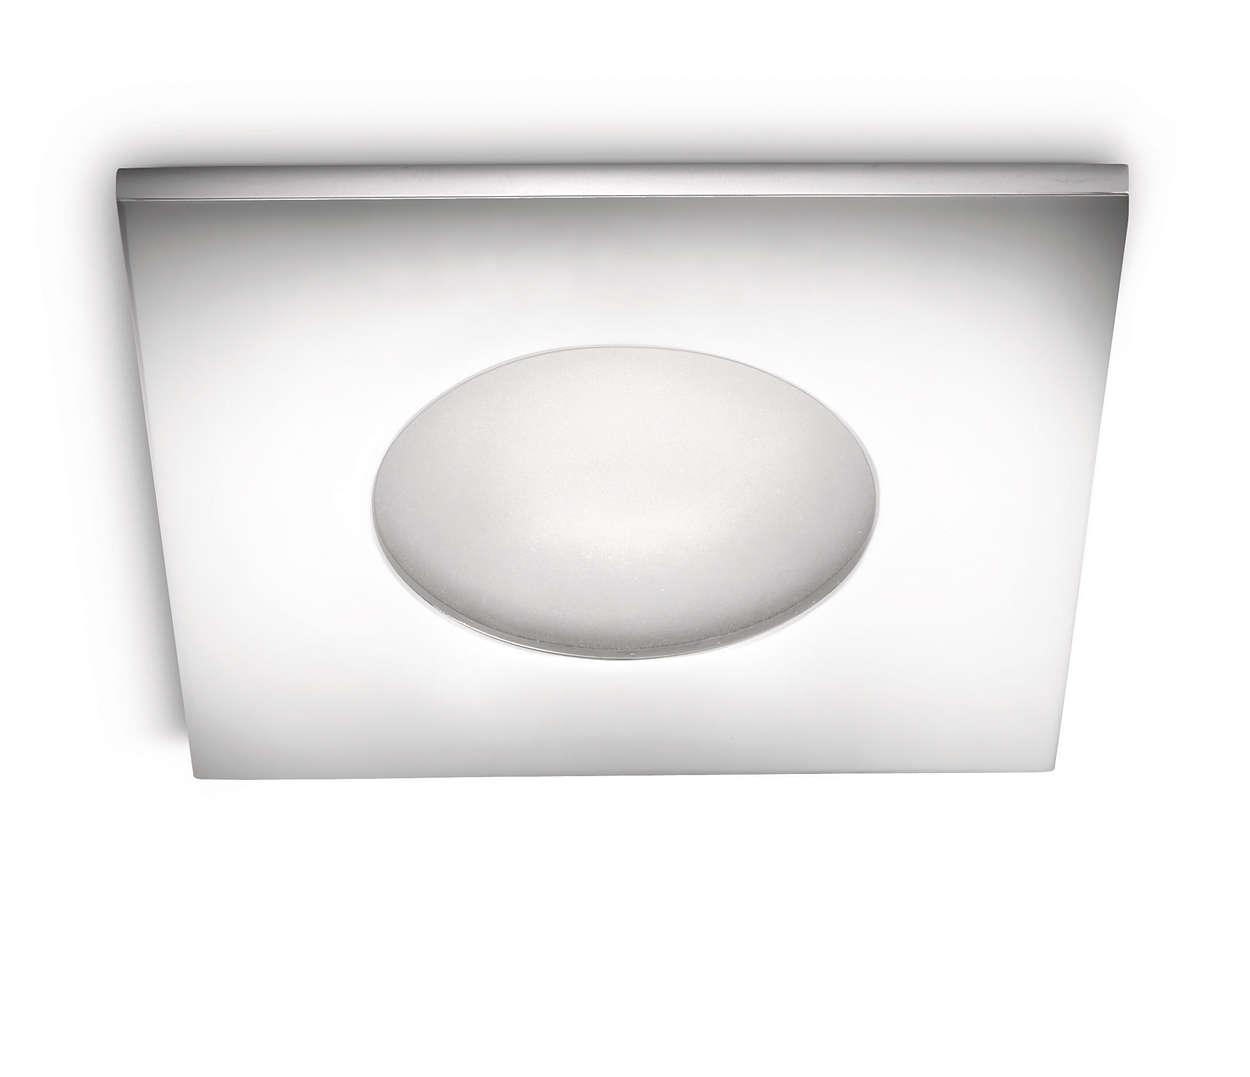 Philips 59910/11/PN MyBathroom Thermal